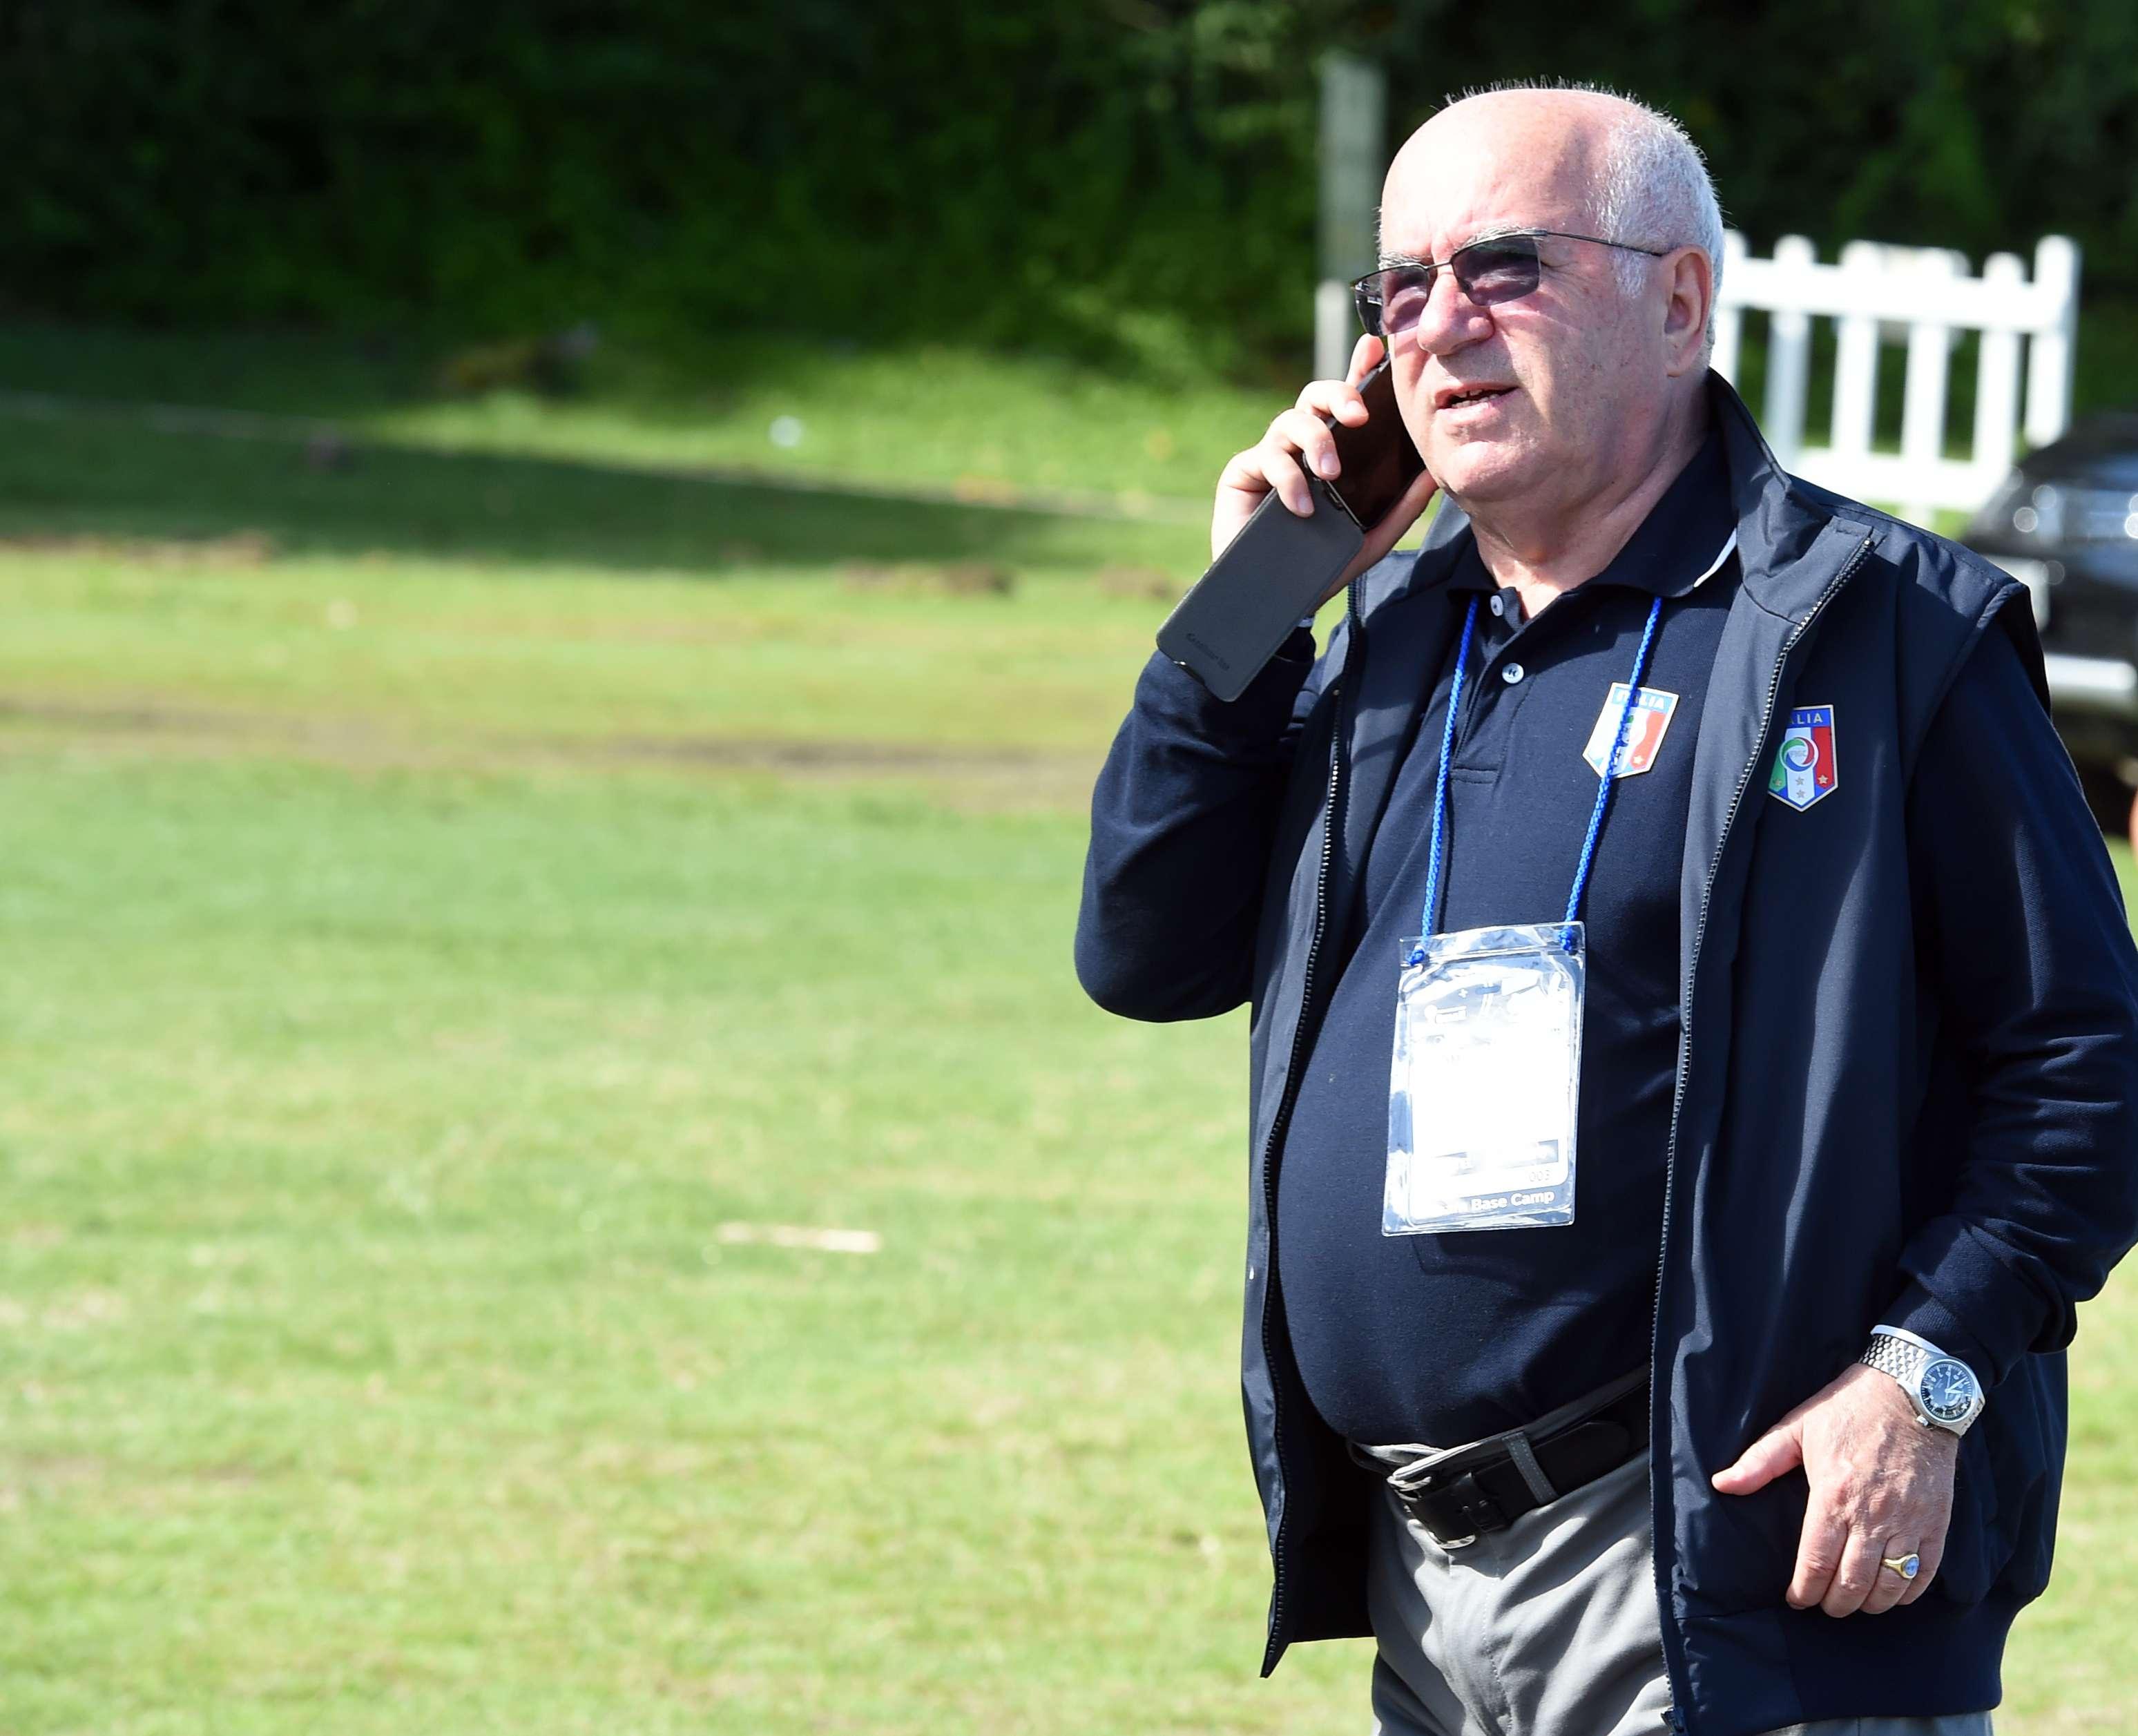 UEFA investiga por racismo al presidente del fútbol italiano